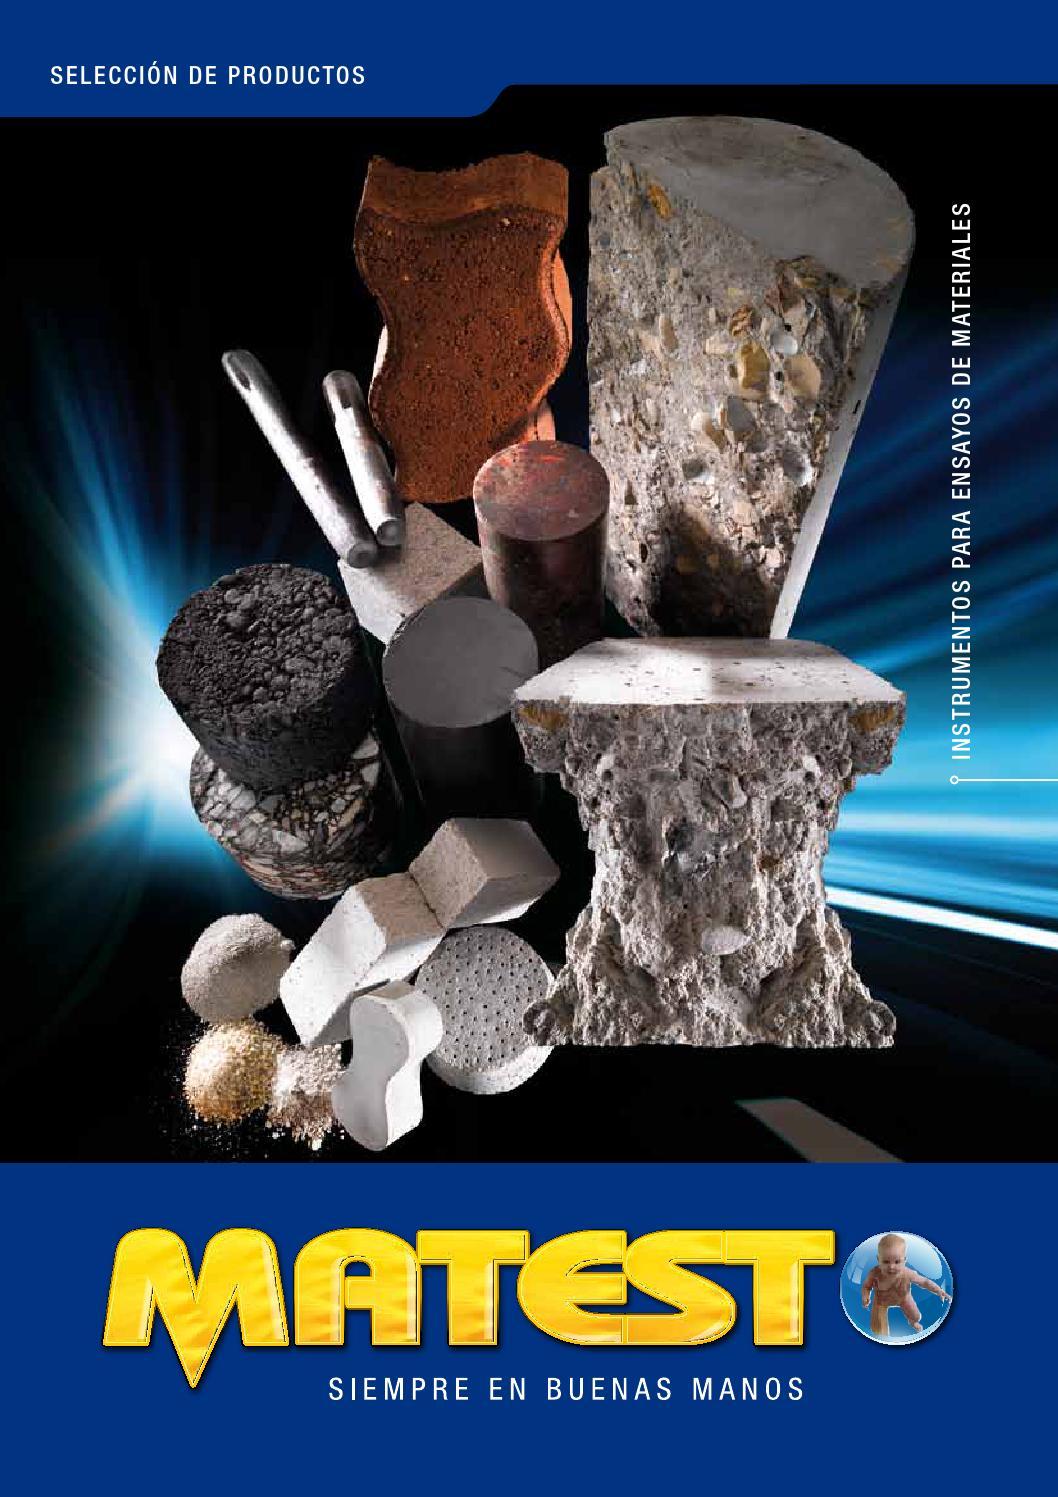 Issuu Matest Brochure Seleccion De Productos 2012